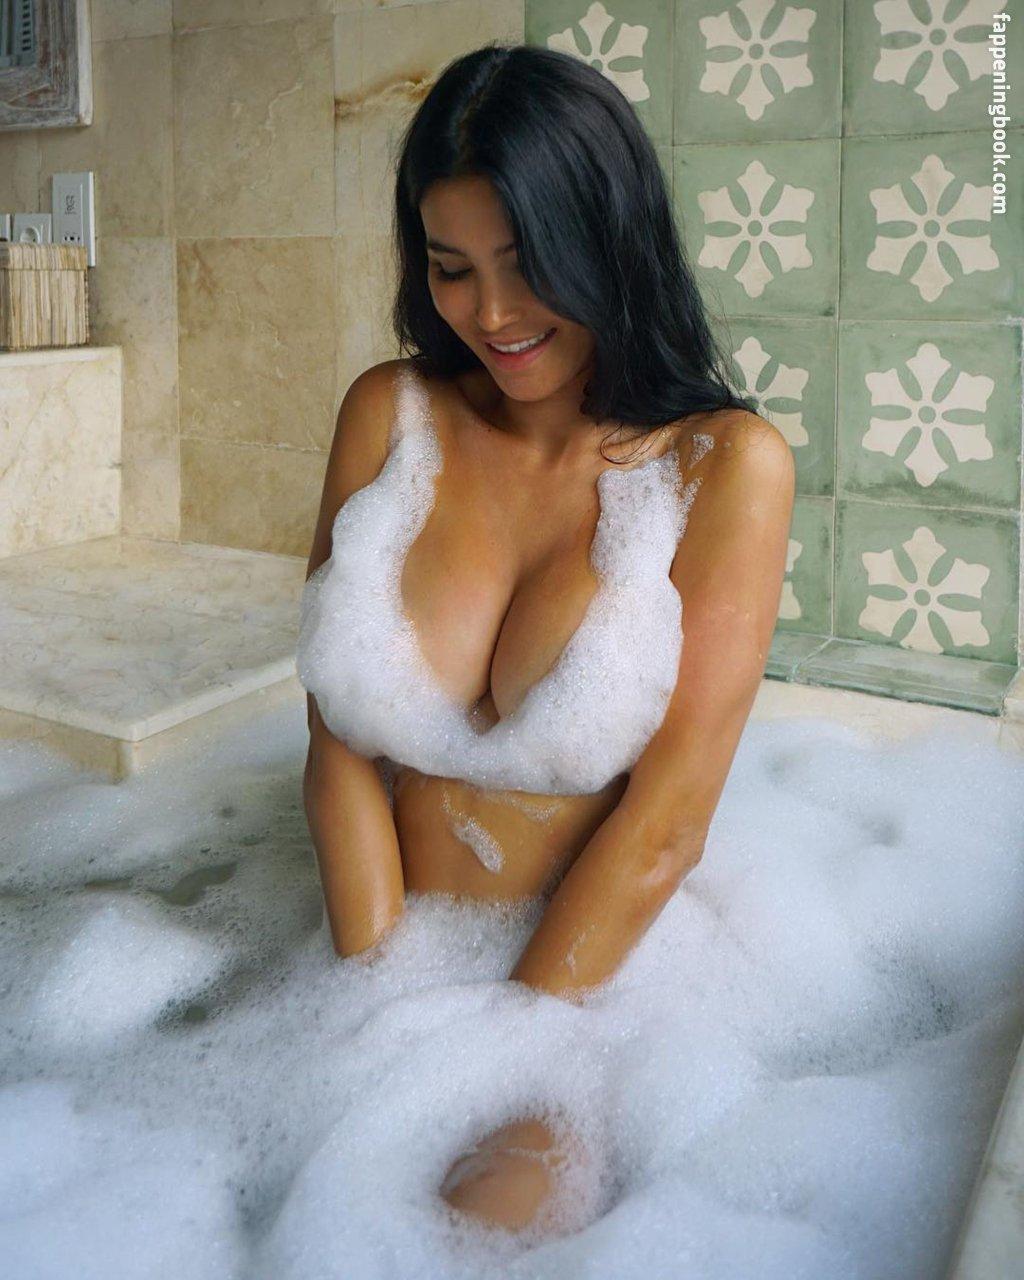 Sveta Bilyalova Nude